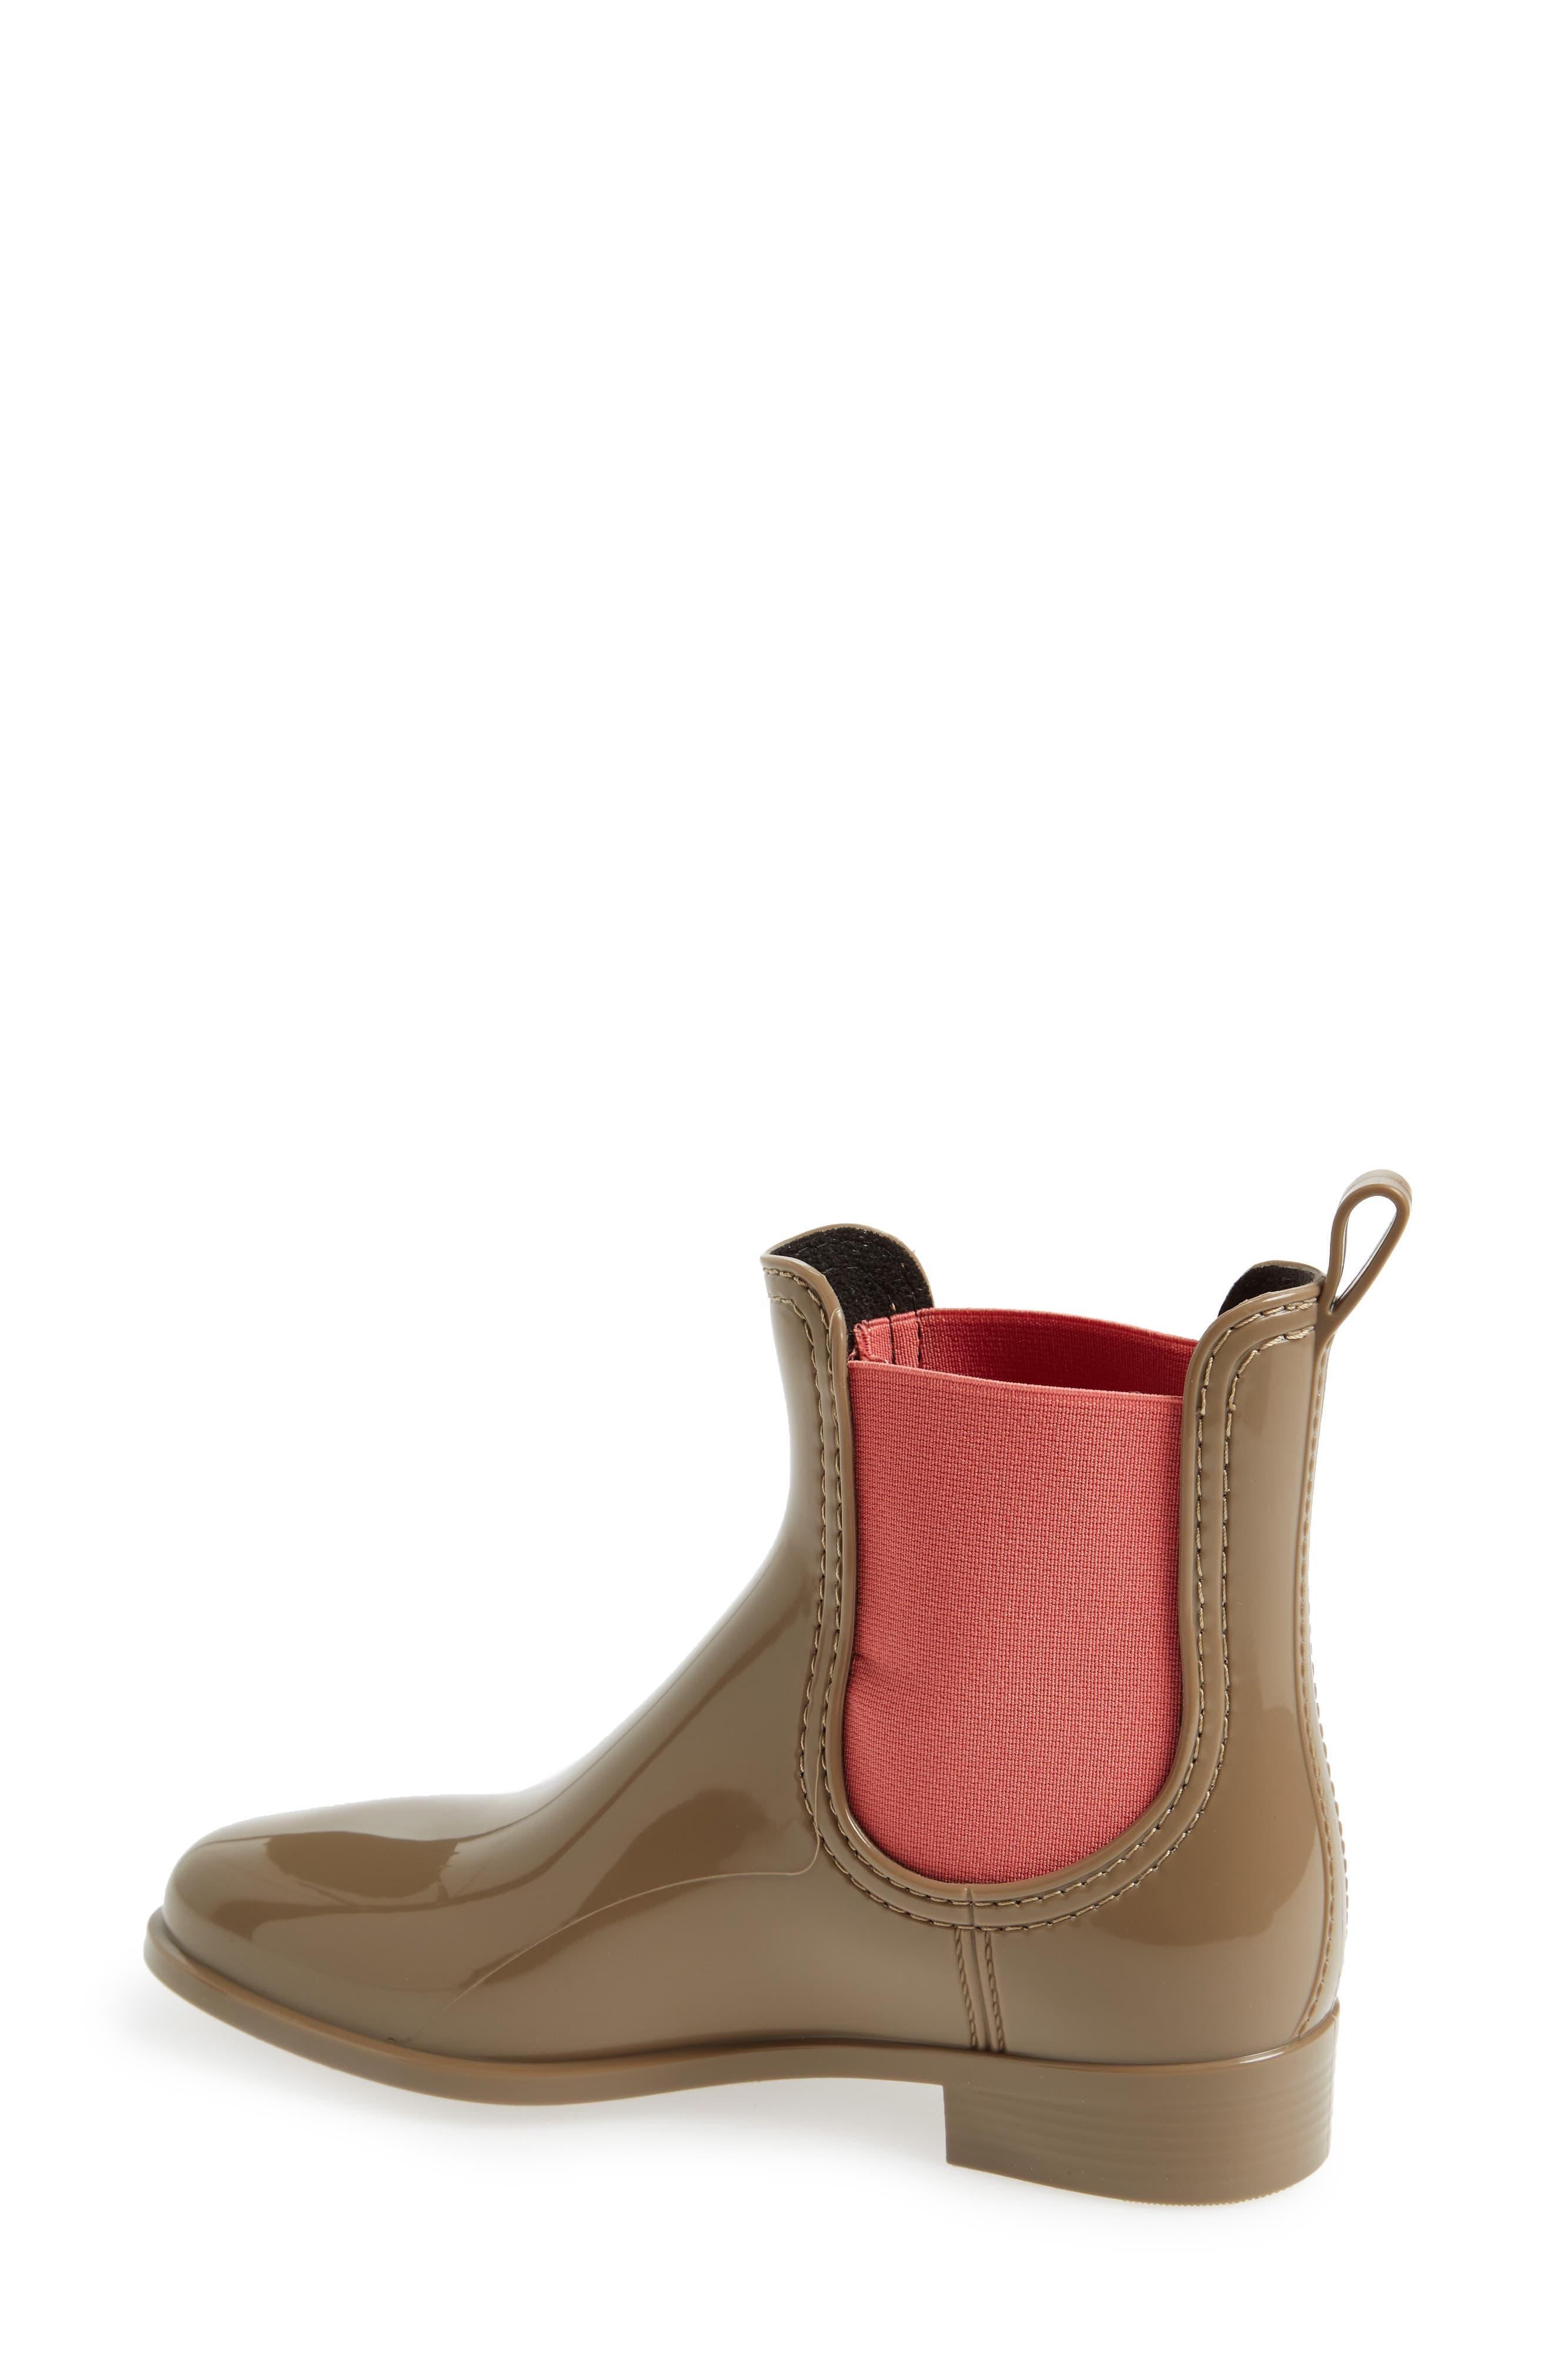 Pisa Waterproof Chelsea Boot,                             Alternate thumbnail 2, color,                             Taupe Gloss